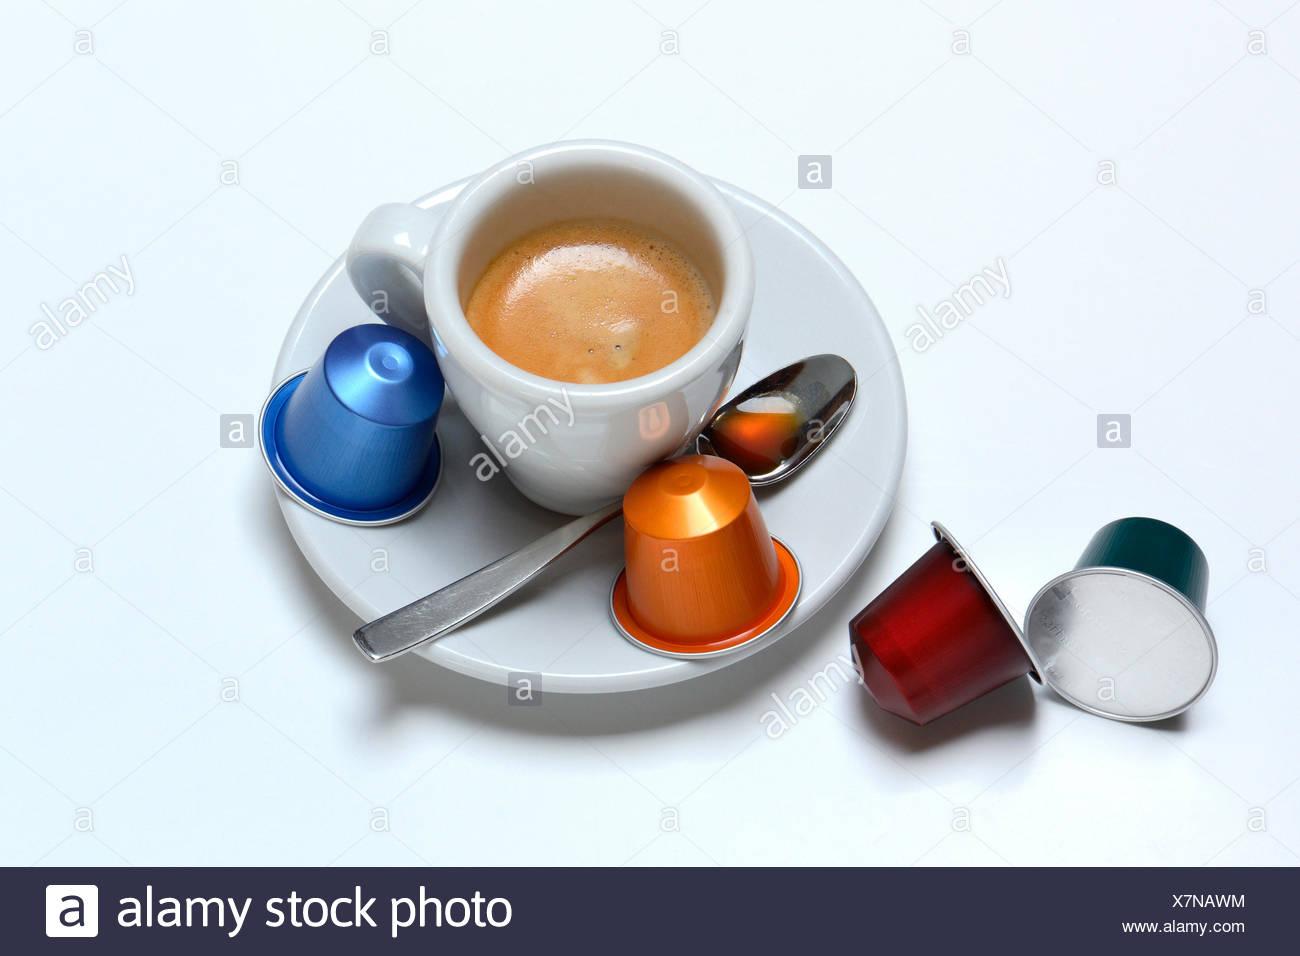 Kaffeekapseln Und Kaffeetasse Mit Espresso Stock Photo 280138032